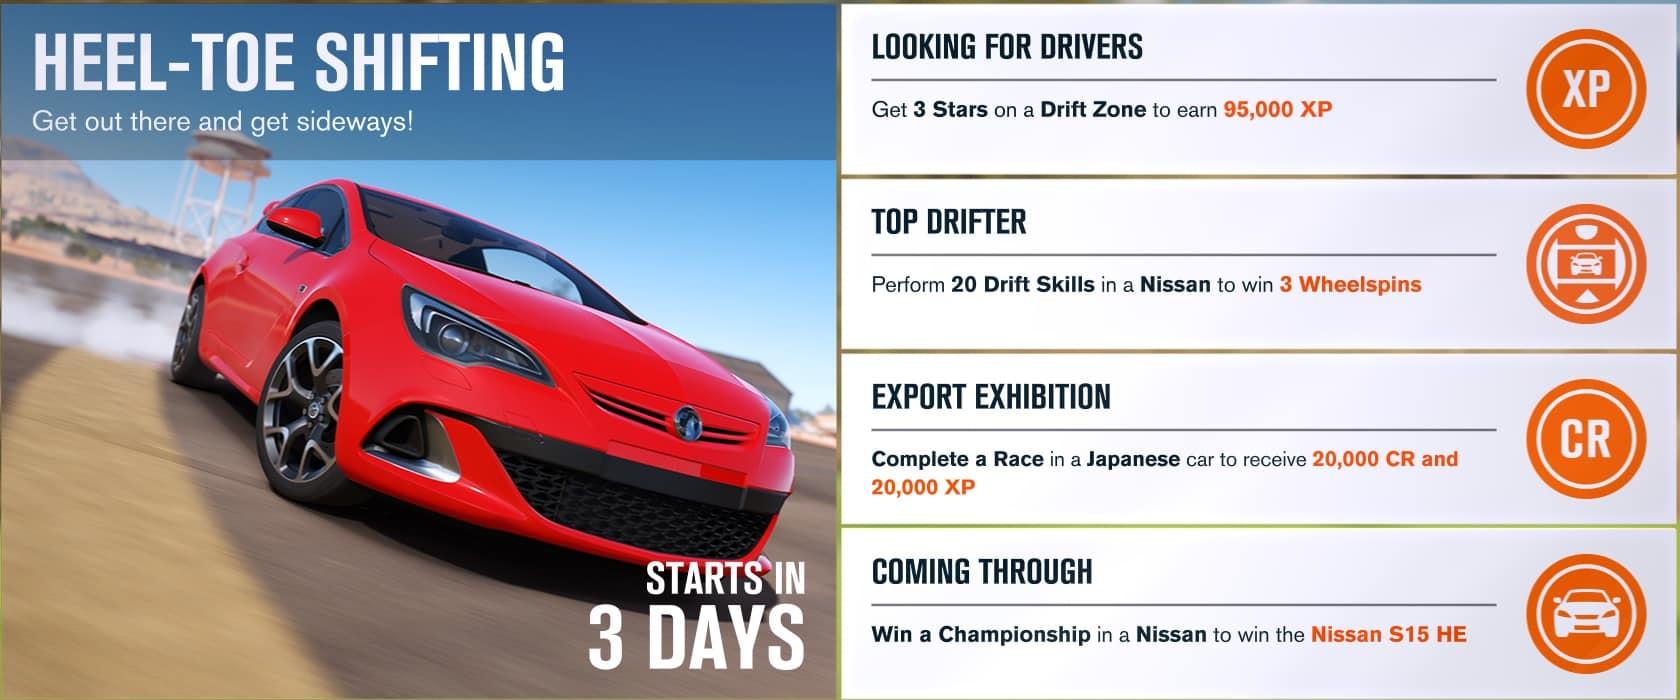 Forza Horizon 3 Forzathon Challenges Week Commencing 4th September 2017 GameSpew